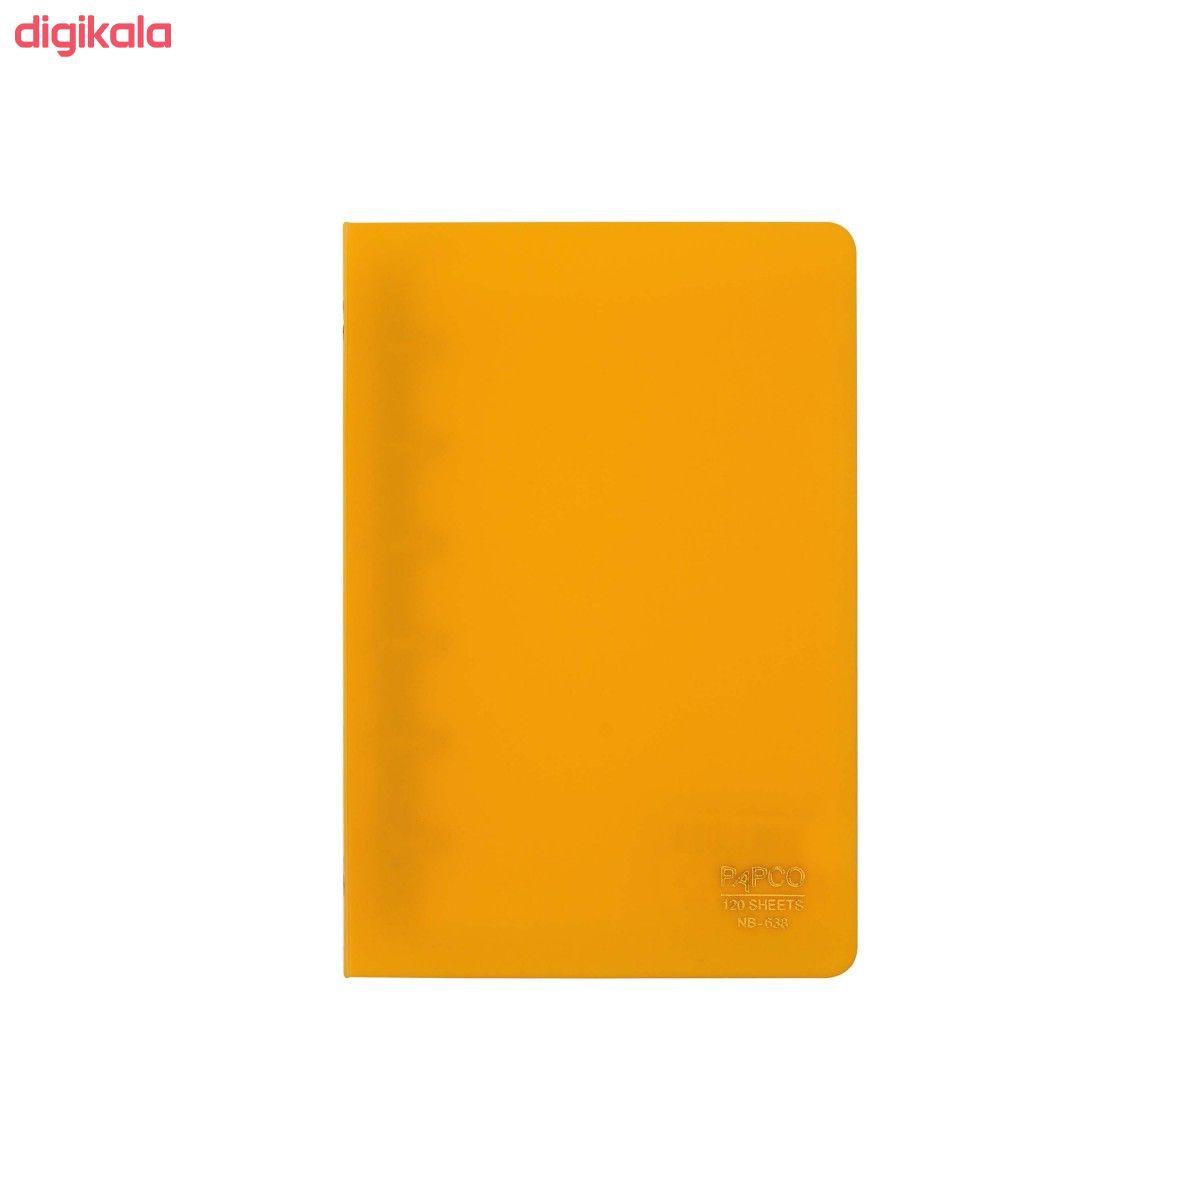 دفتر یادداشت 120 برگ پاپکو مدل  NB-638 کد HT01 main 1 2